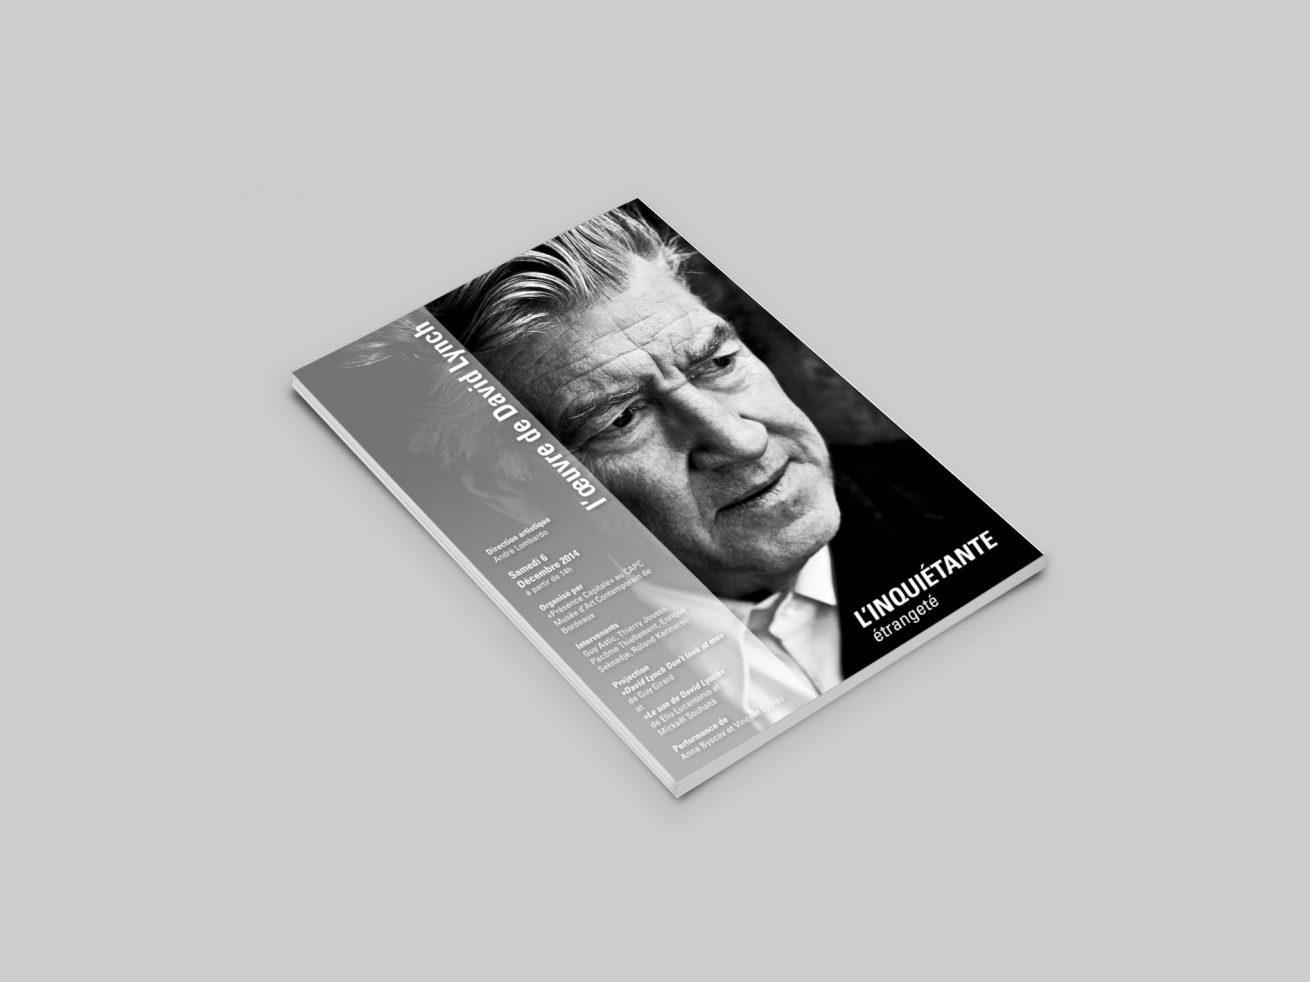 L'inquiétante étrangeté David Lynch | Booklet by Artlinkz